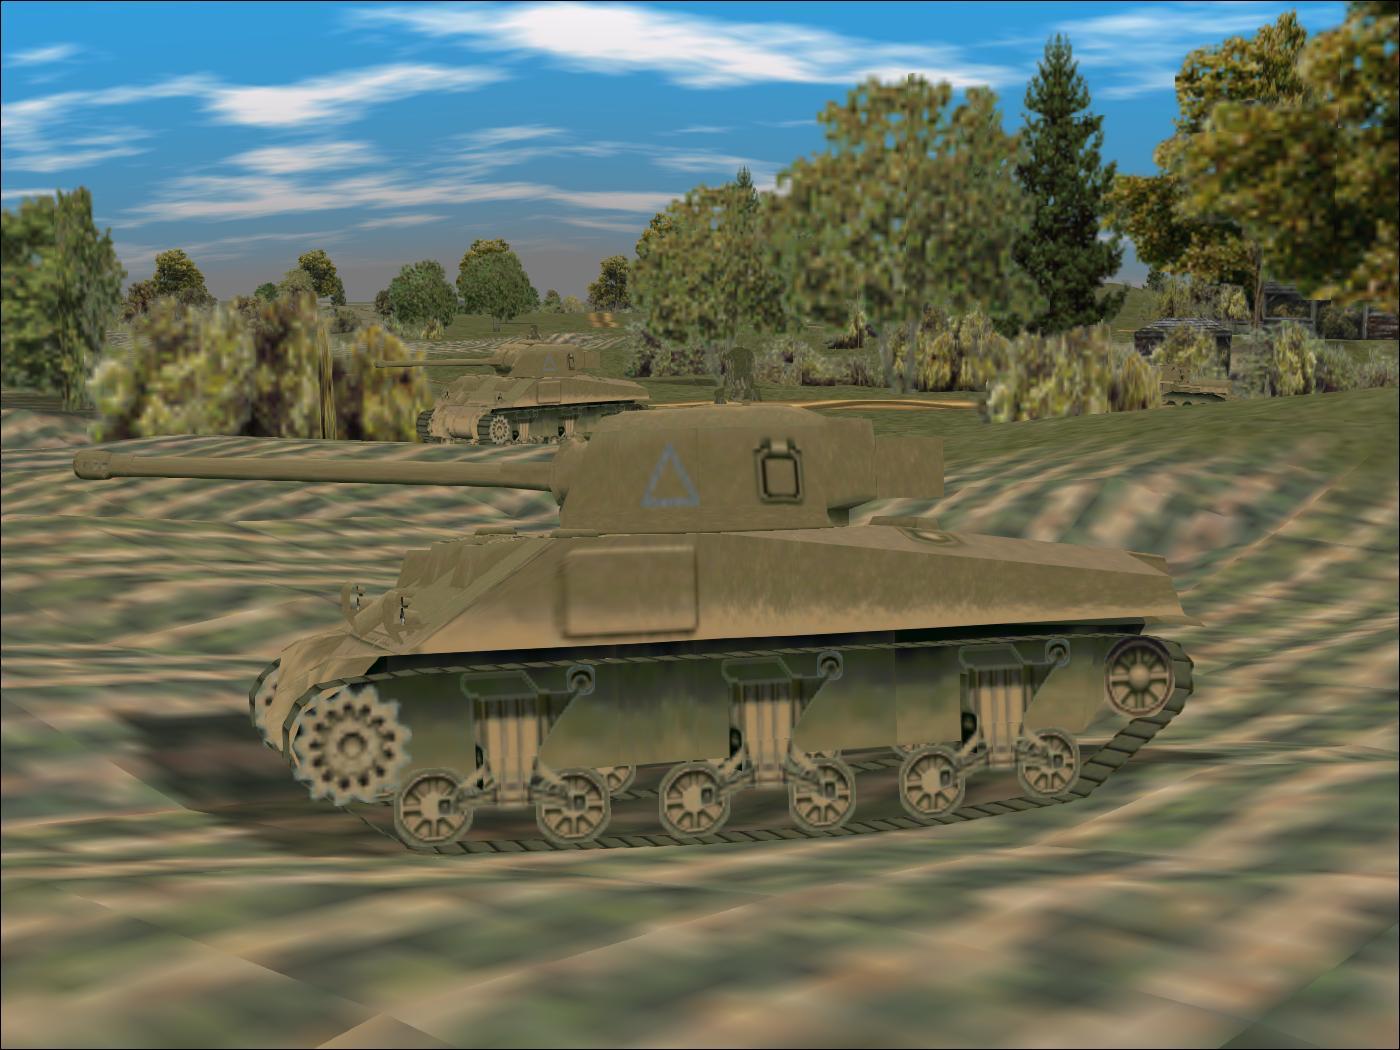 Panzer Elite Brit44-x beta - Sherman Fireflies, Normandy